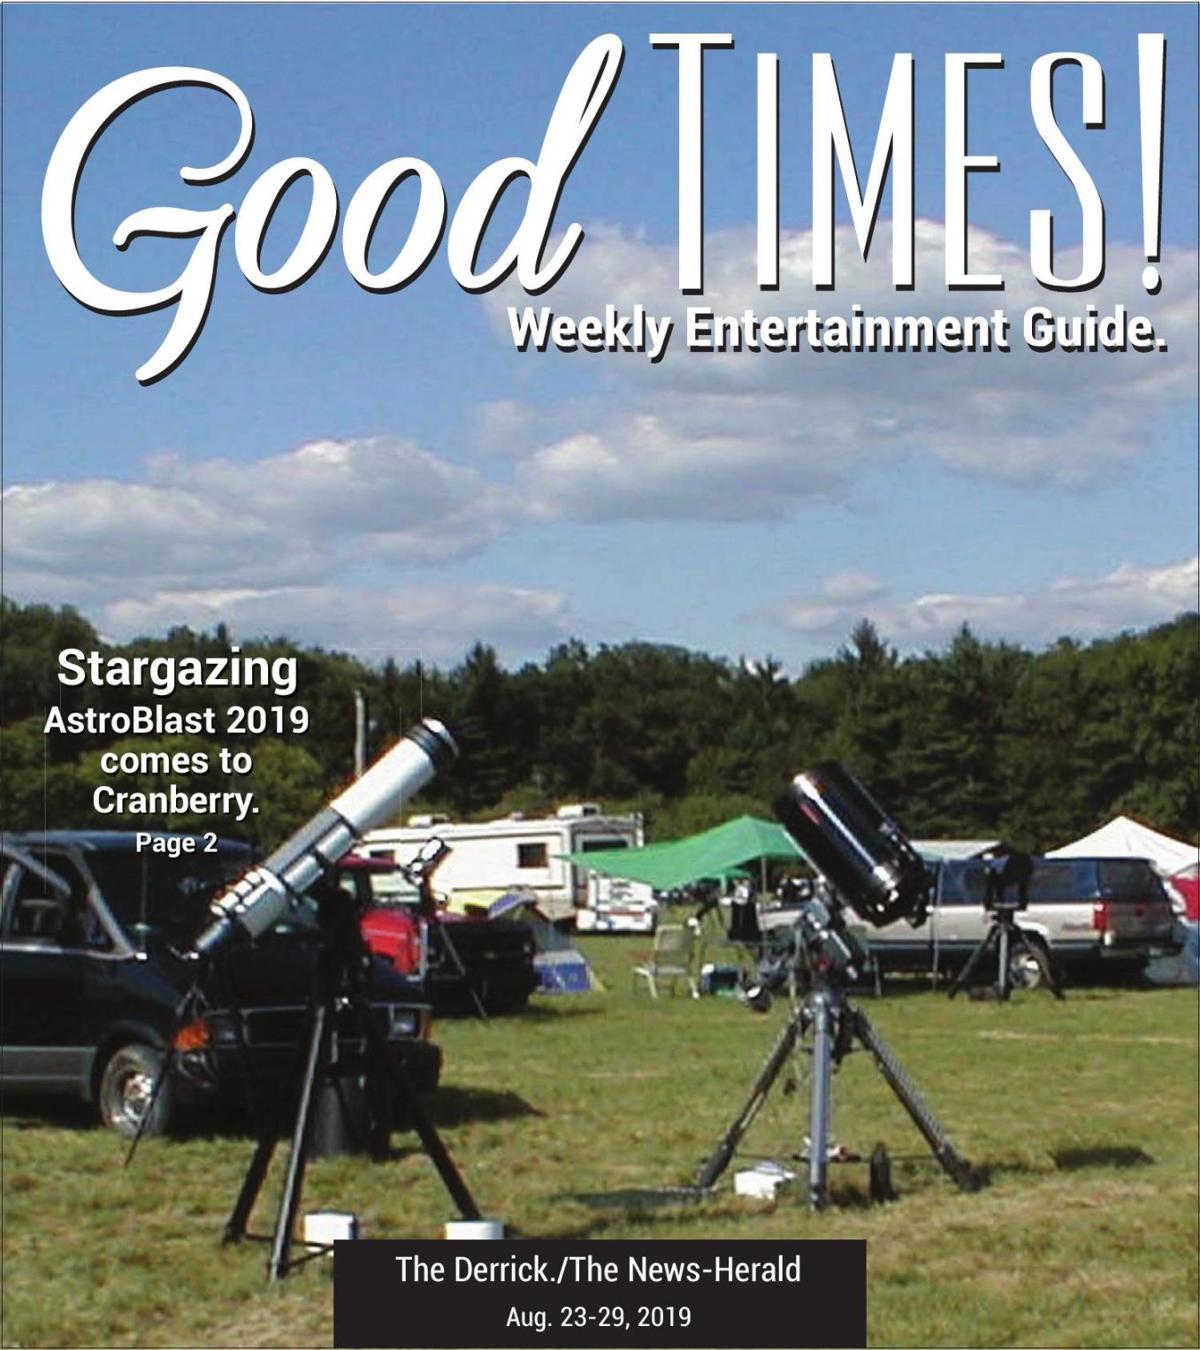 Good Times 8-23-19